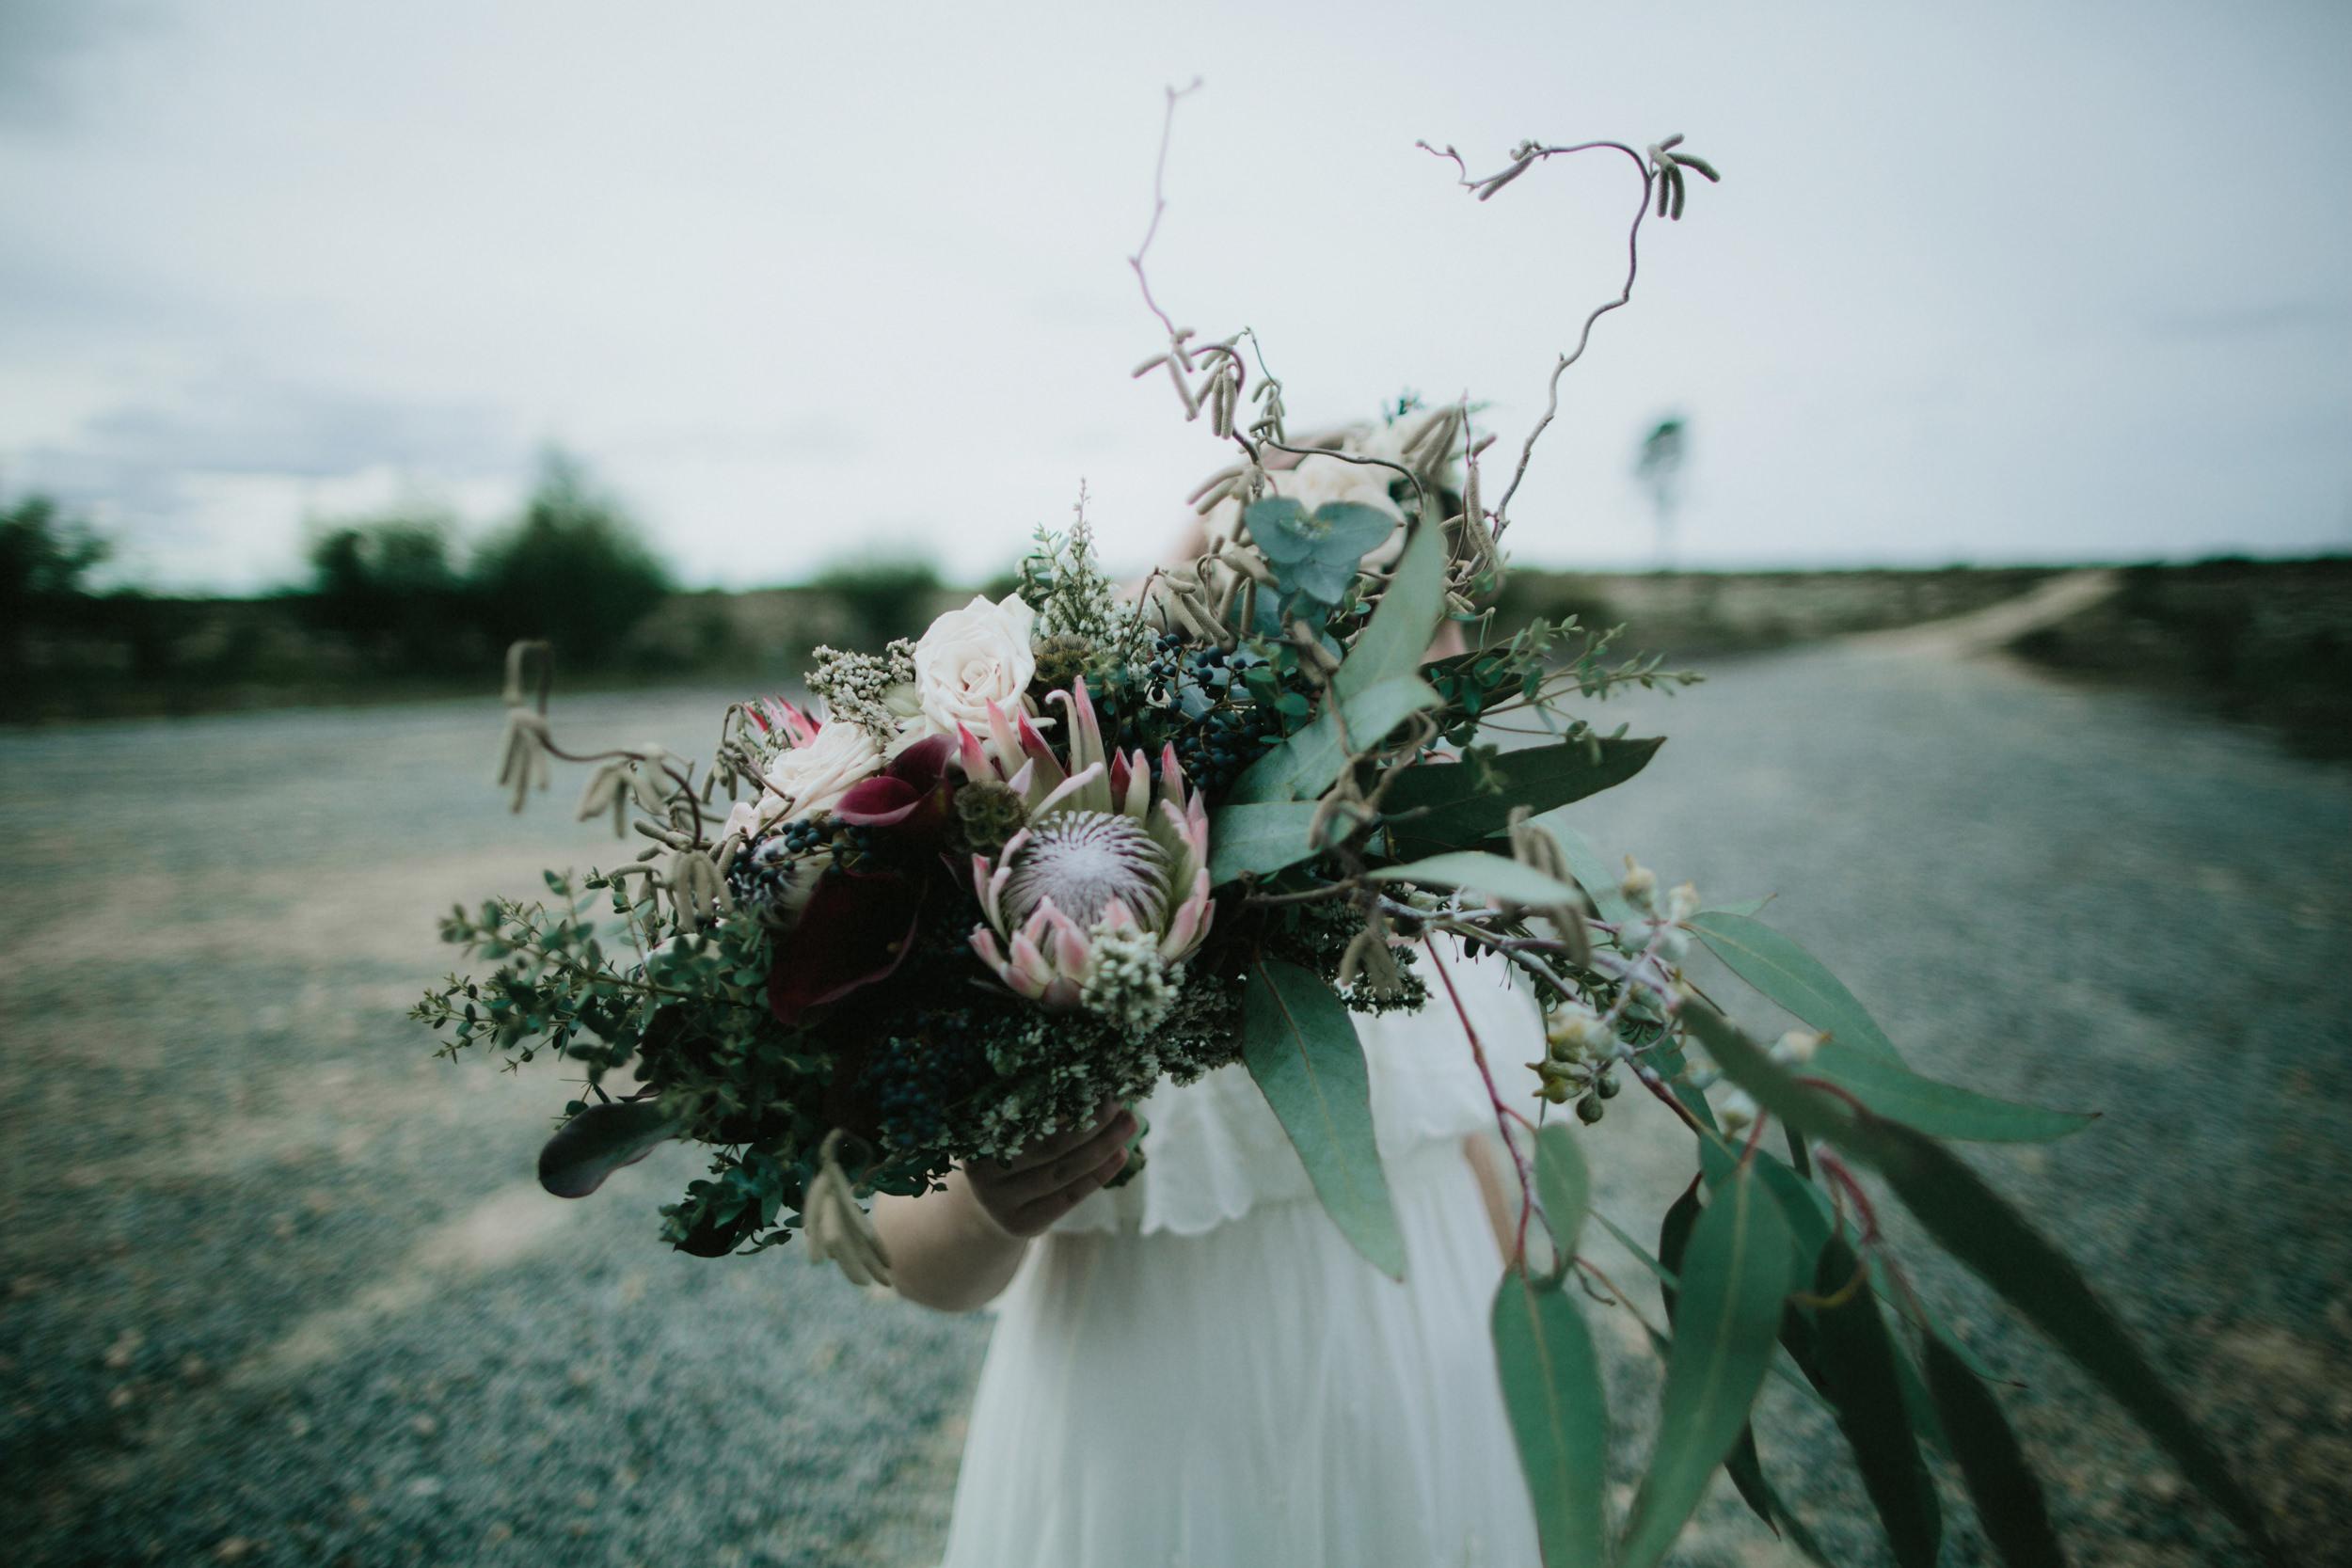 I-Got-You-Babe-Weddings-Hannah-Brent-Anniversary0003.JPG